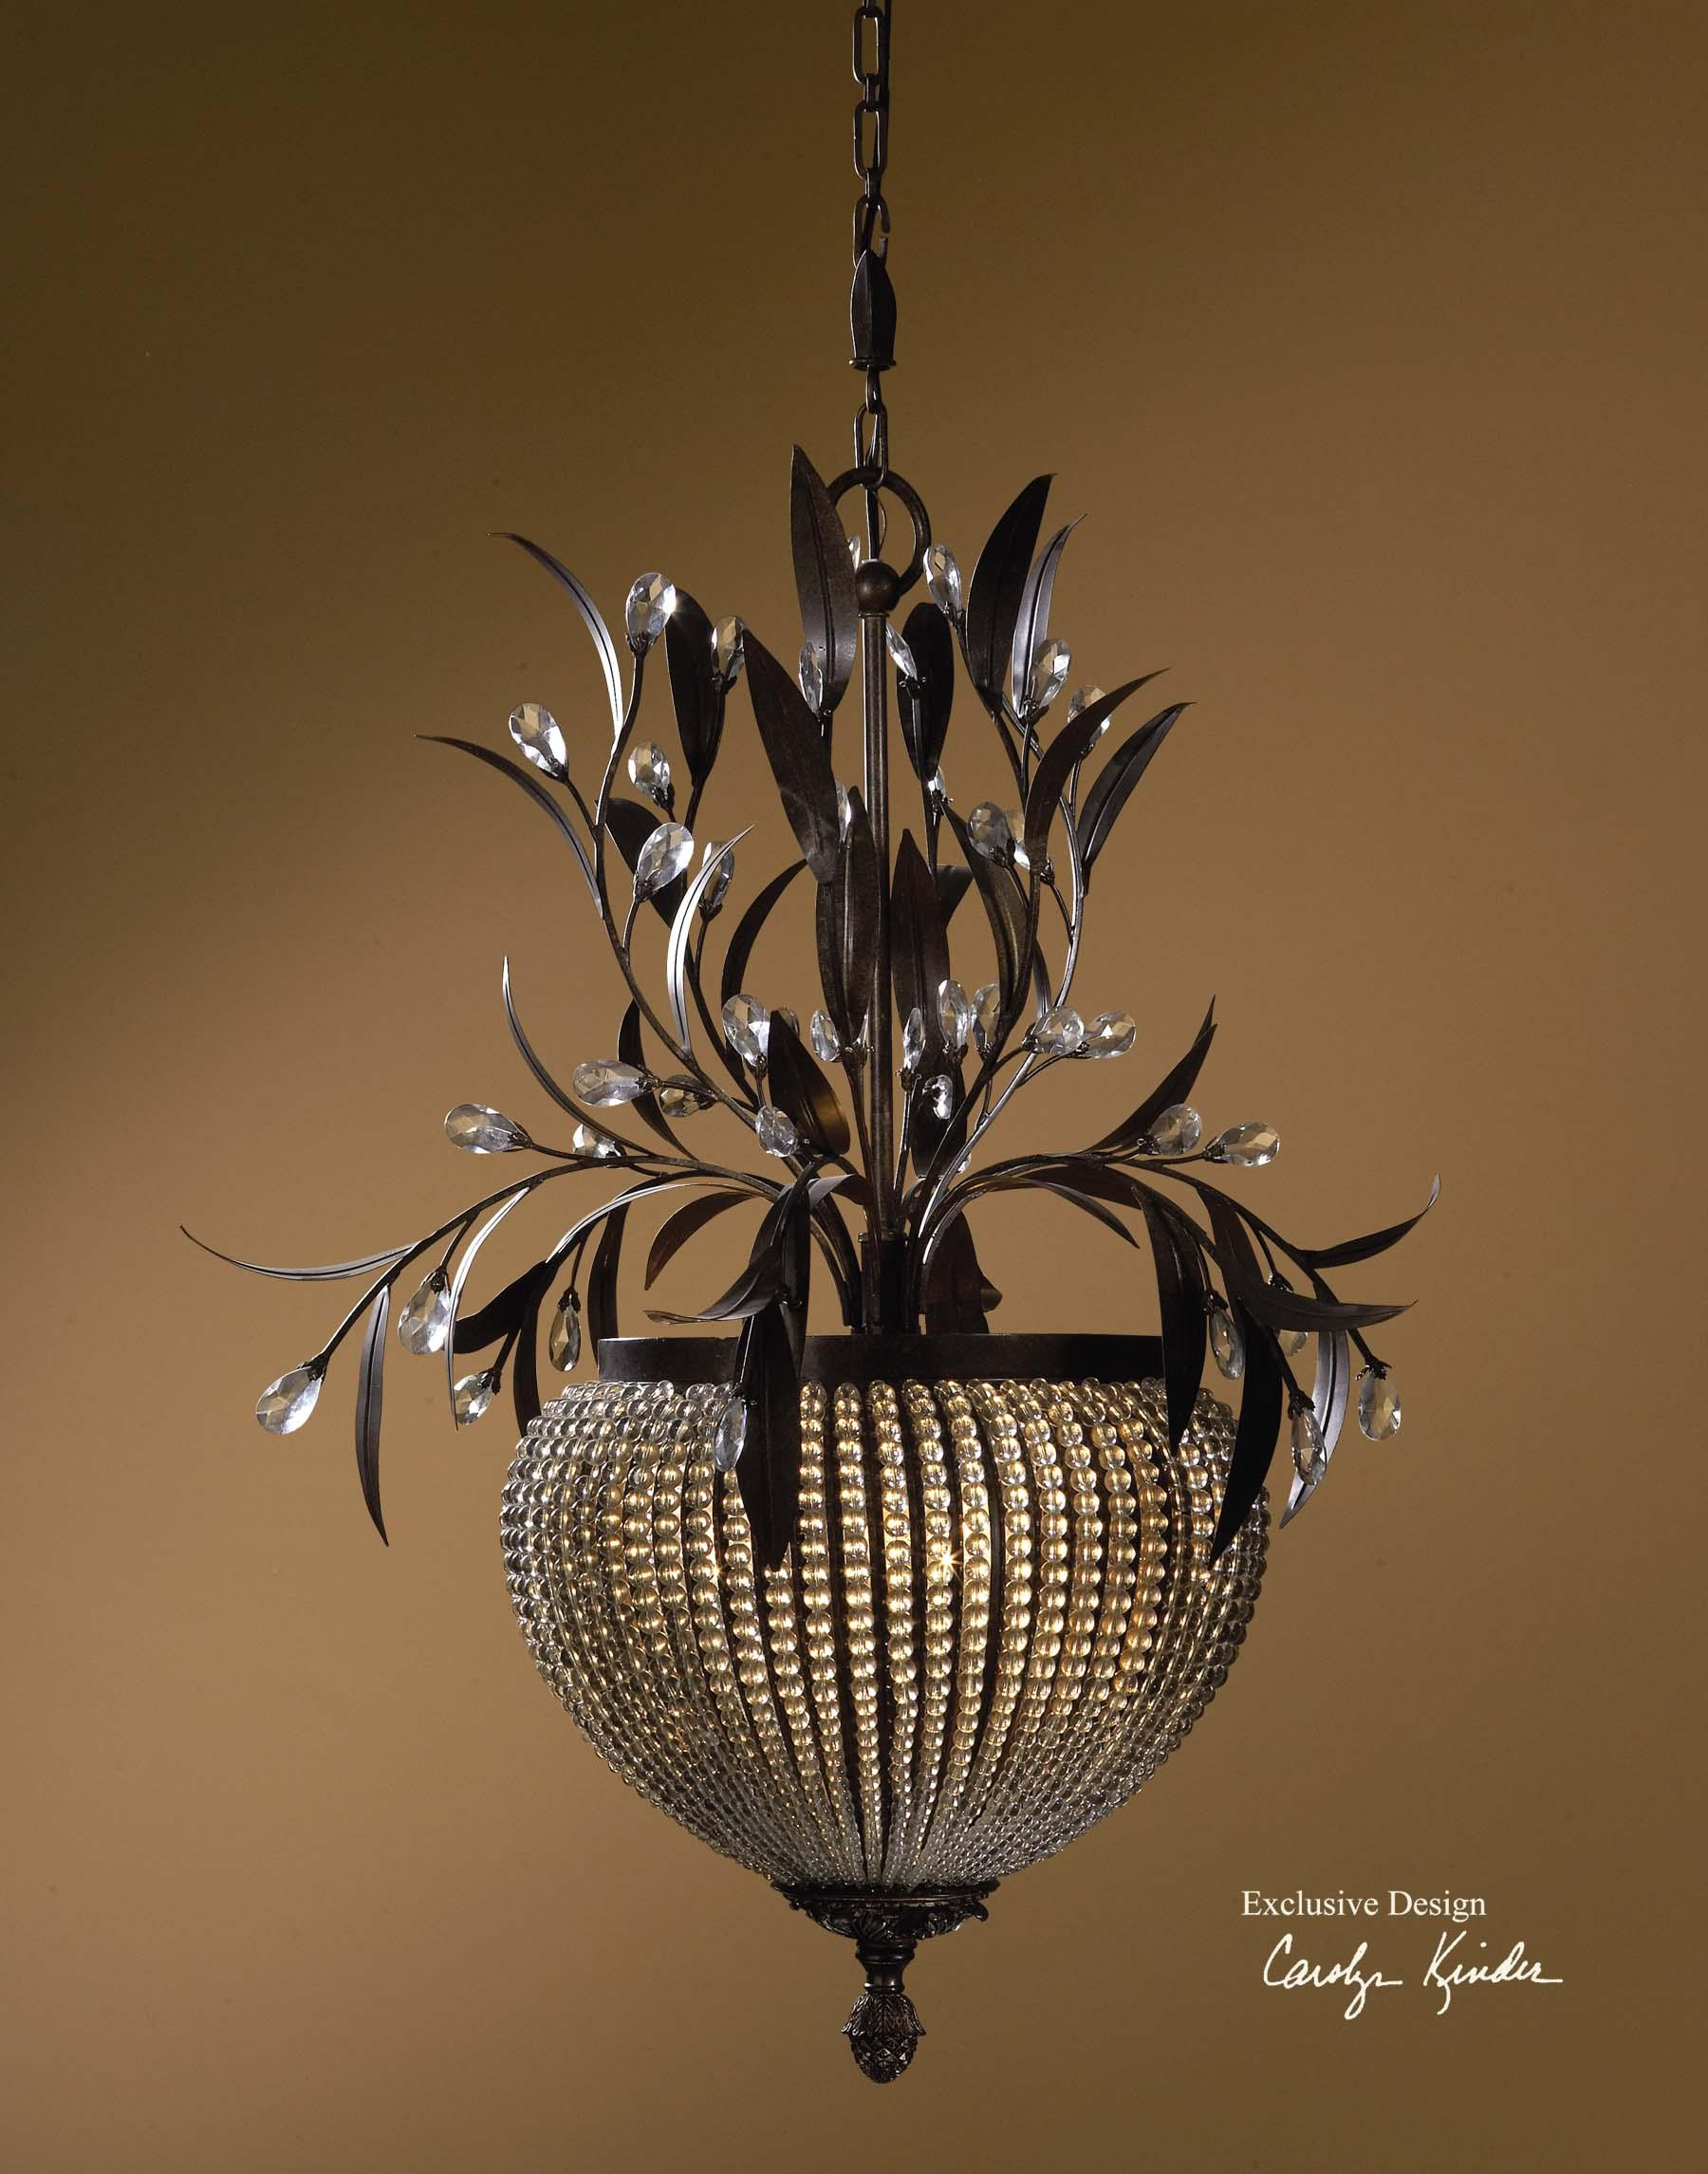 Uttermost Lighting Fixtures Cristal De Lisbon 3-Light Chandelier - Item Number: 21004